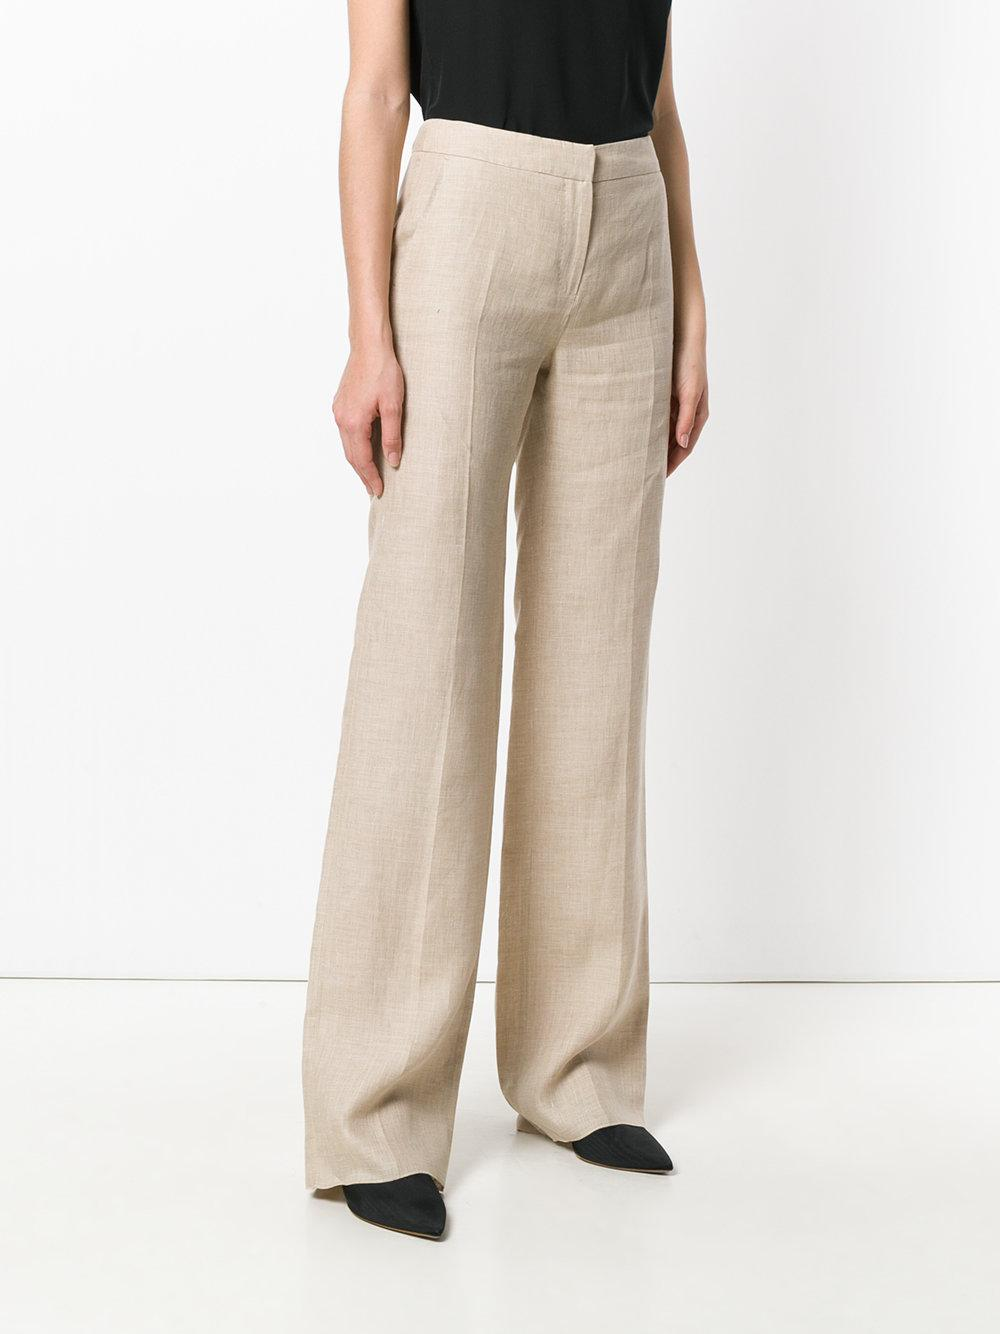 wide-leg trousers - Nude & Neutrals Max Mara hkcyekPY